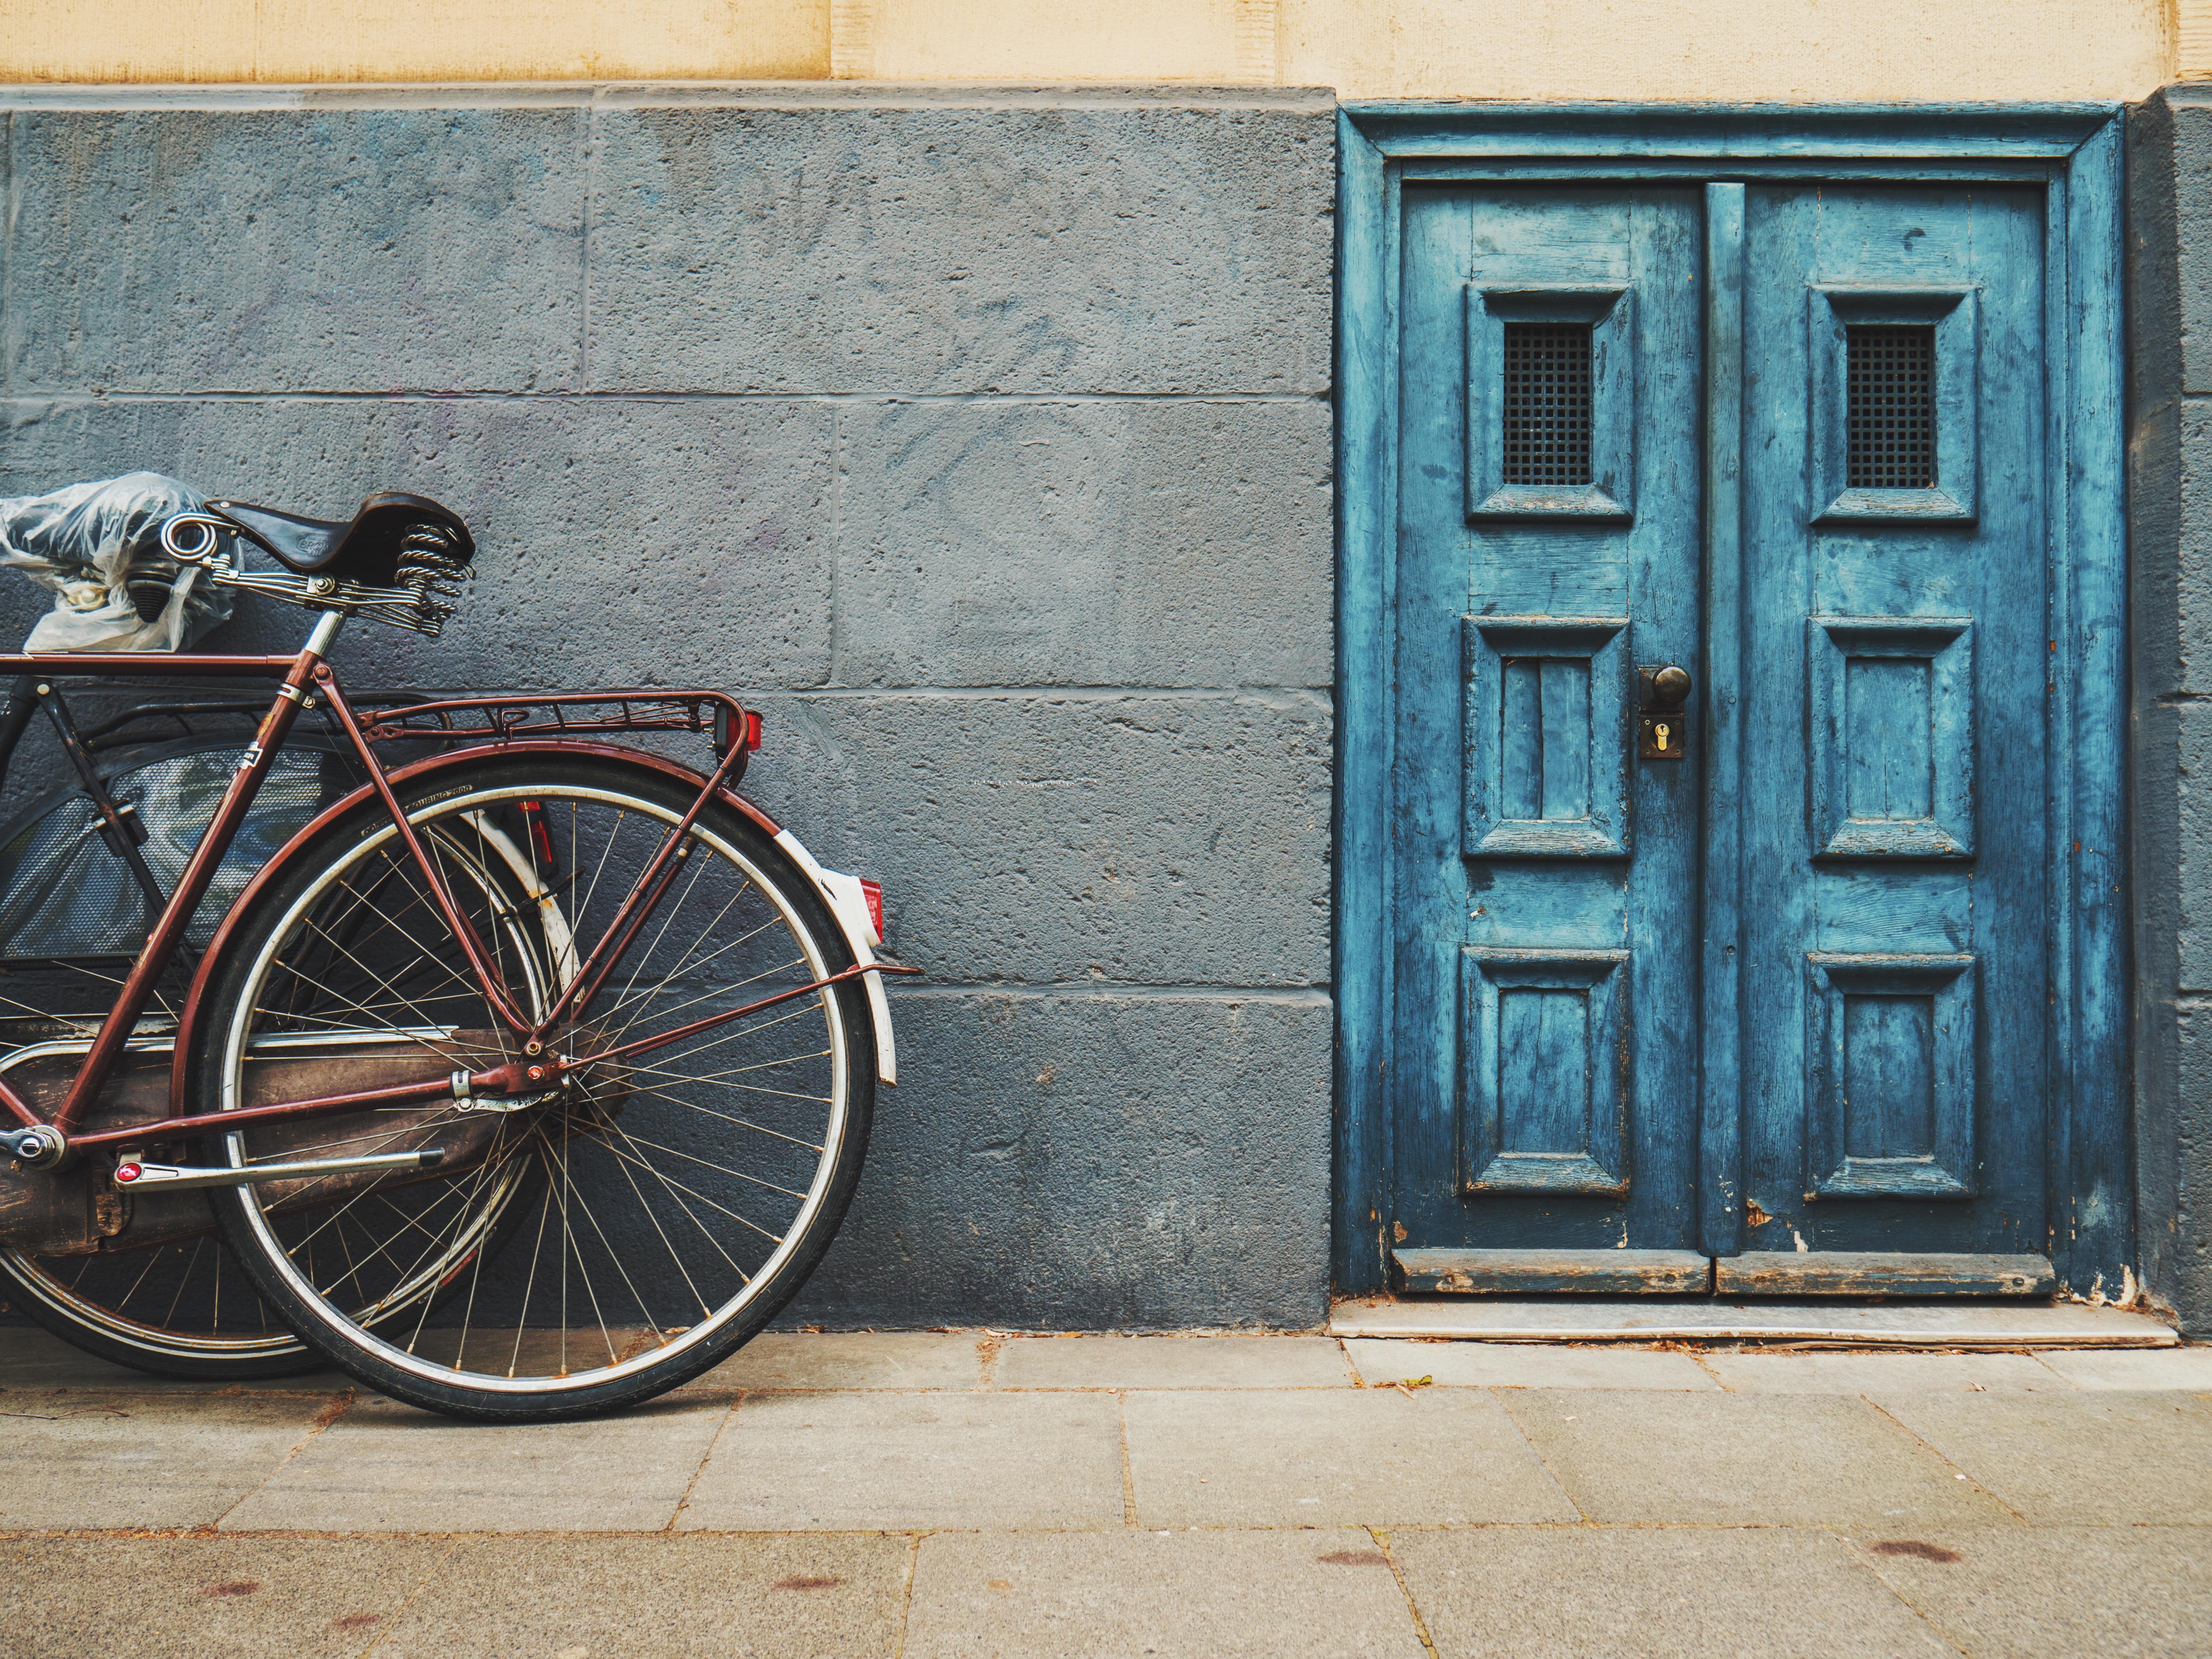 Kostenlose foto : Straße, Rad, Haus, Fenster, Gebäude, Fahrrad ...